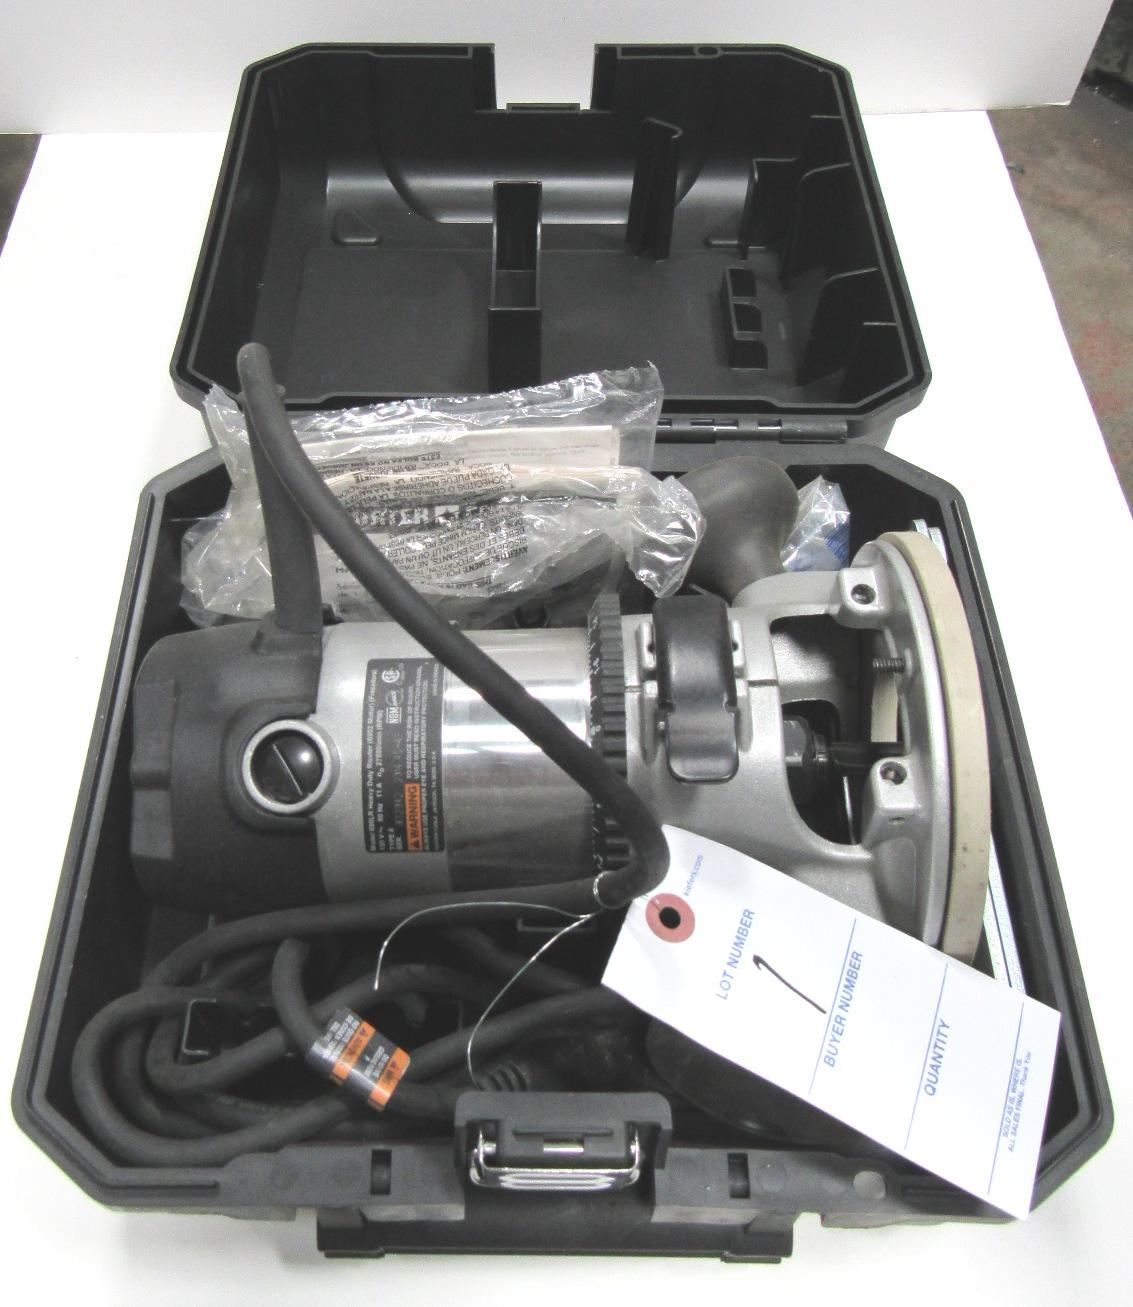 Lot 1 - Porter Cable Mod 690LR 1-3/4HP Heavy Duty Router